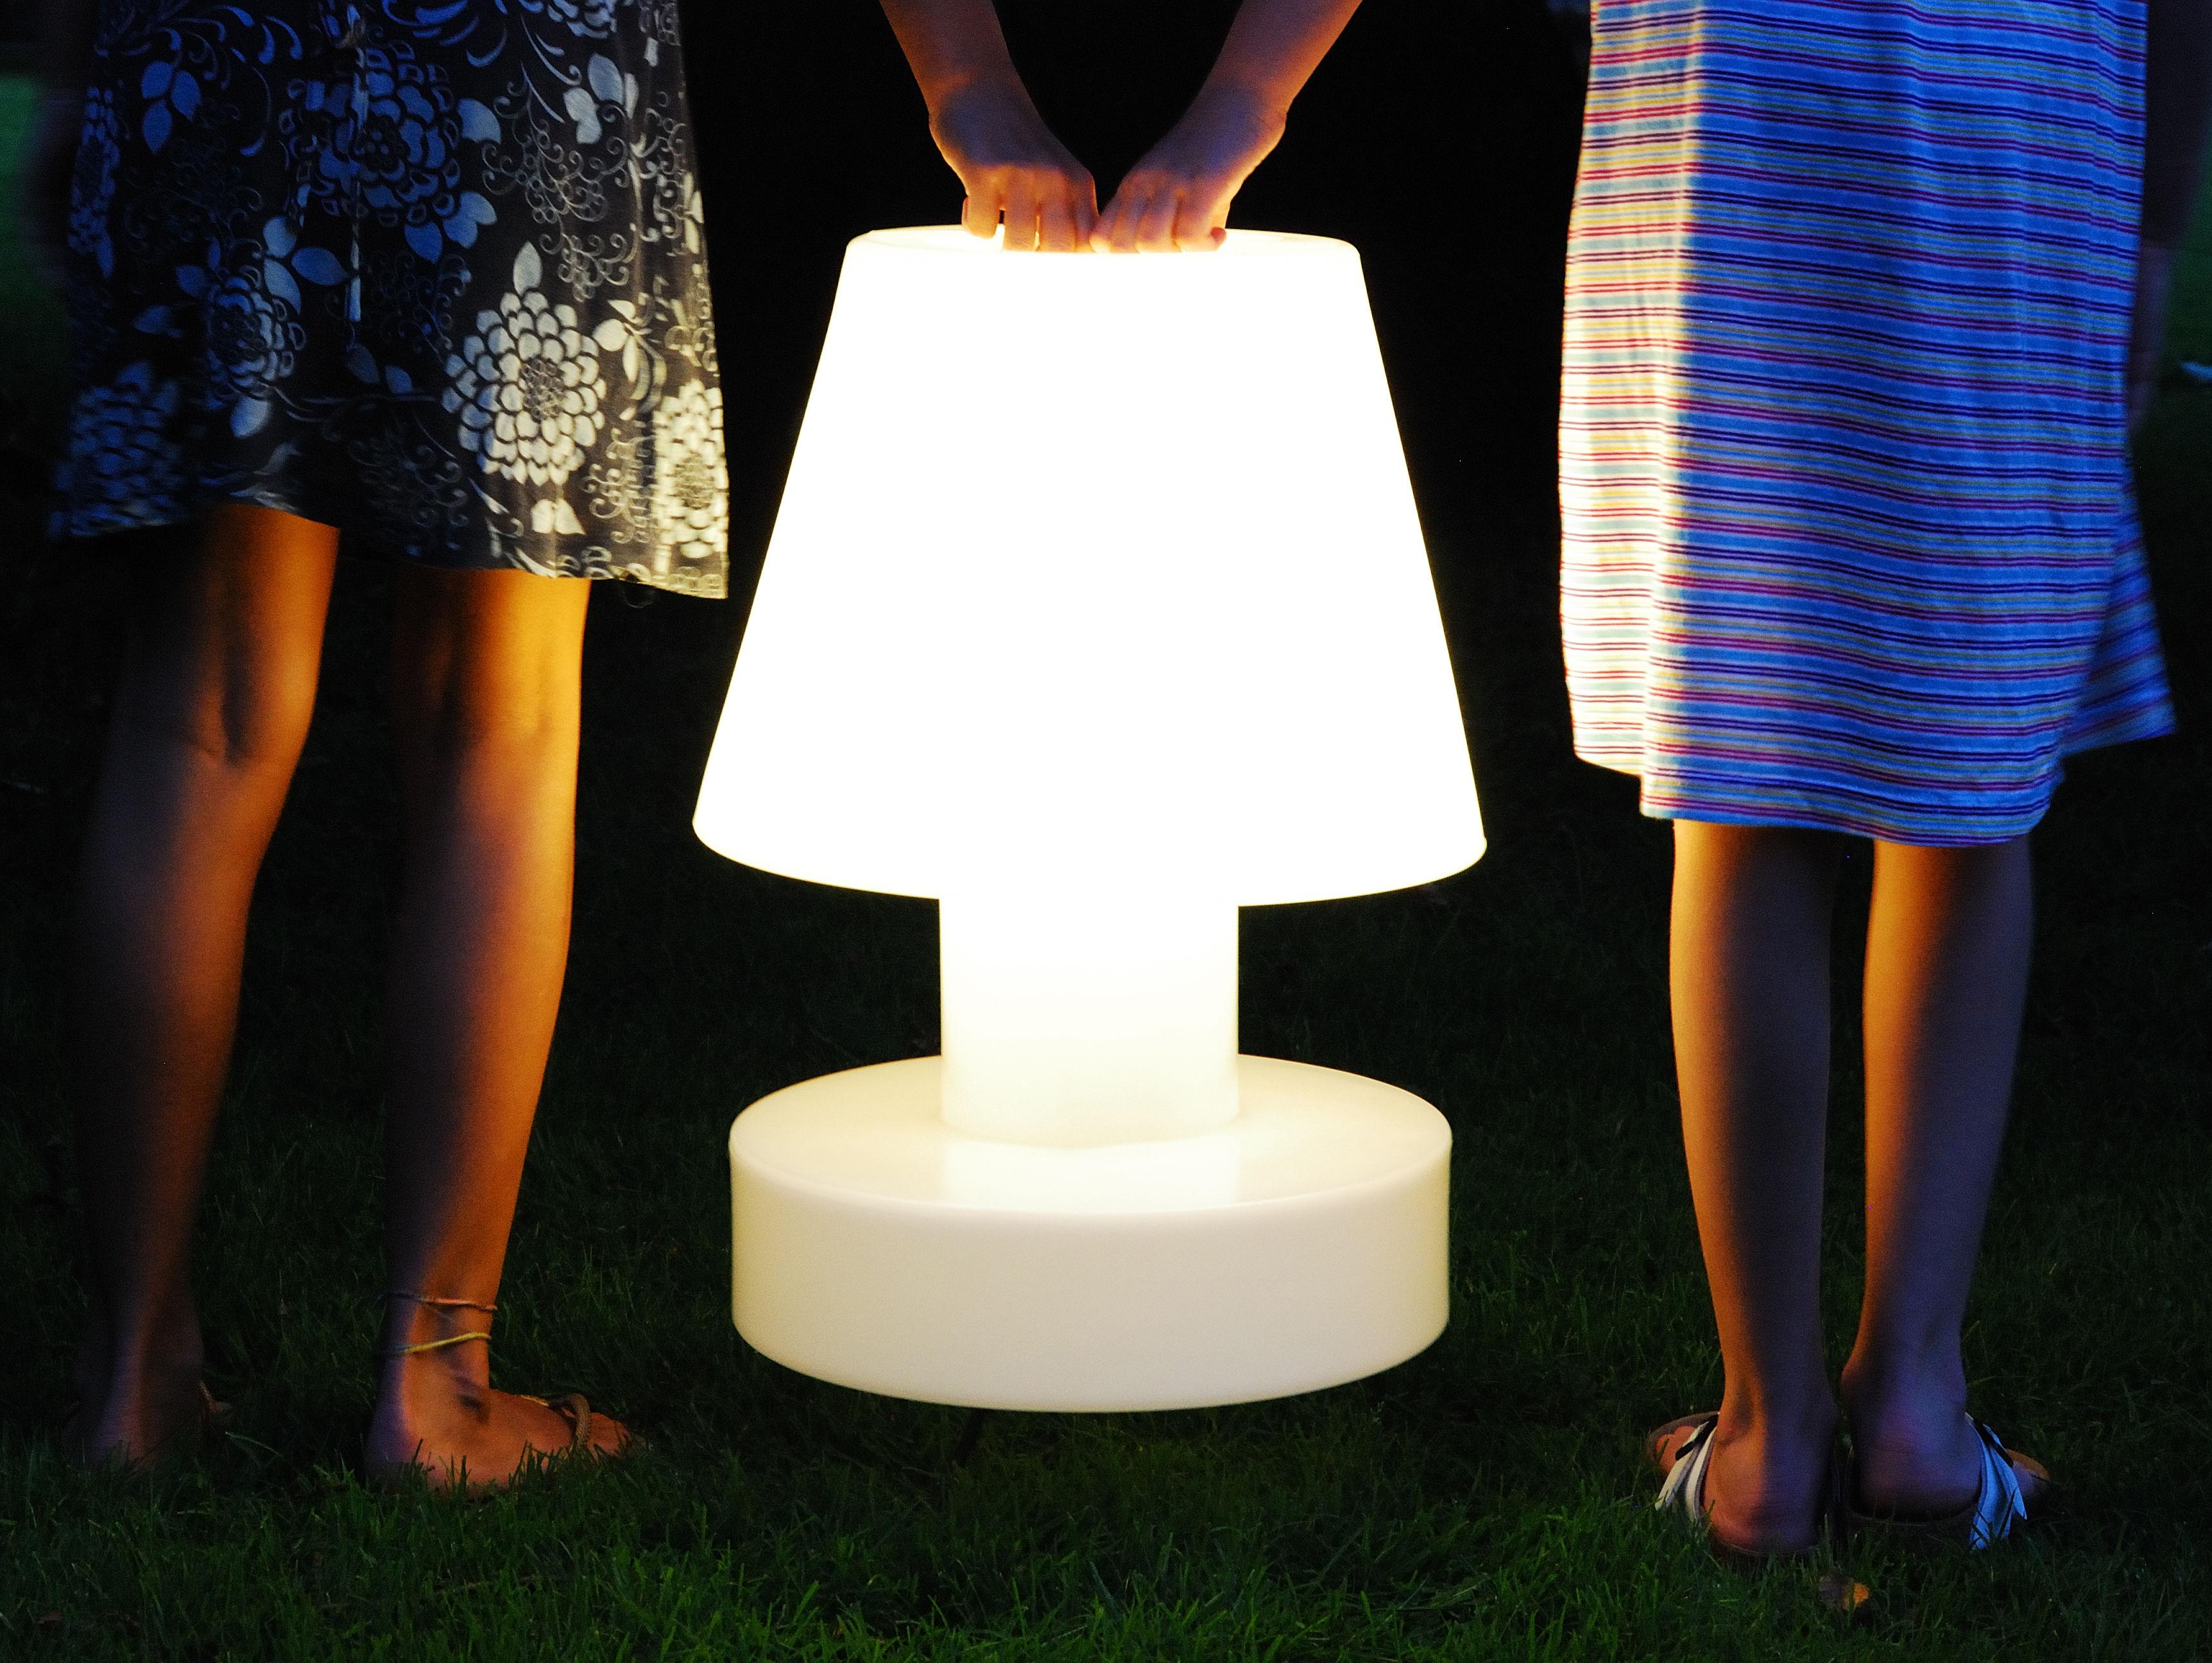 Scopri Lampada senza fili -Portatile senza filo ricaricabile - h 40 cm, Bianco - h 40 cm di ...